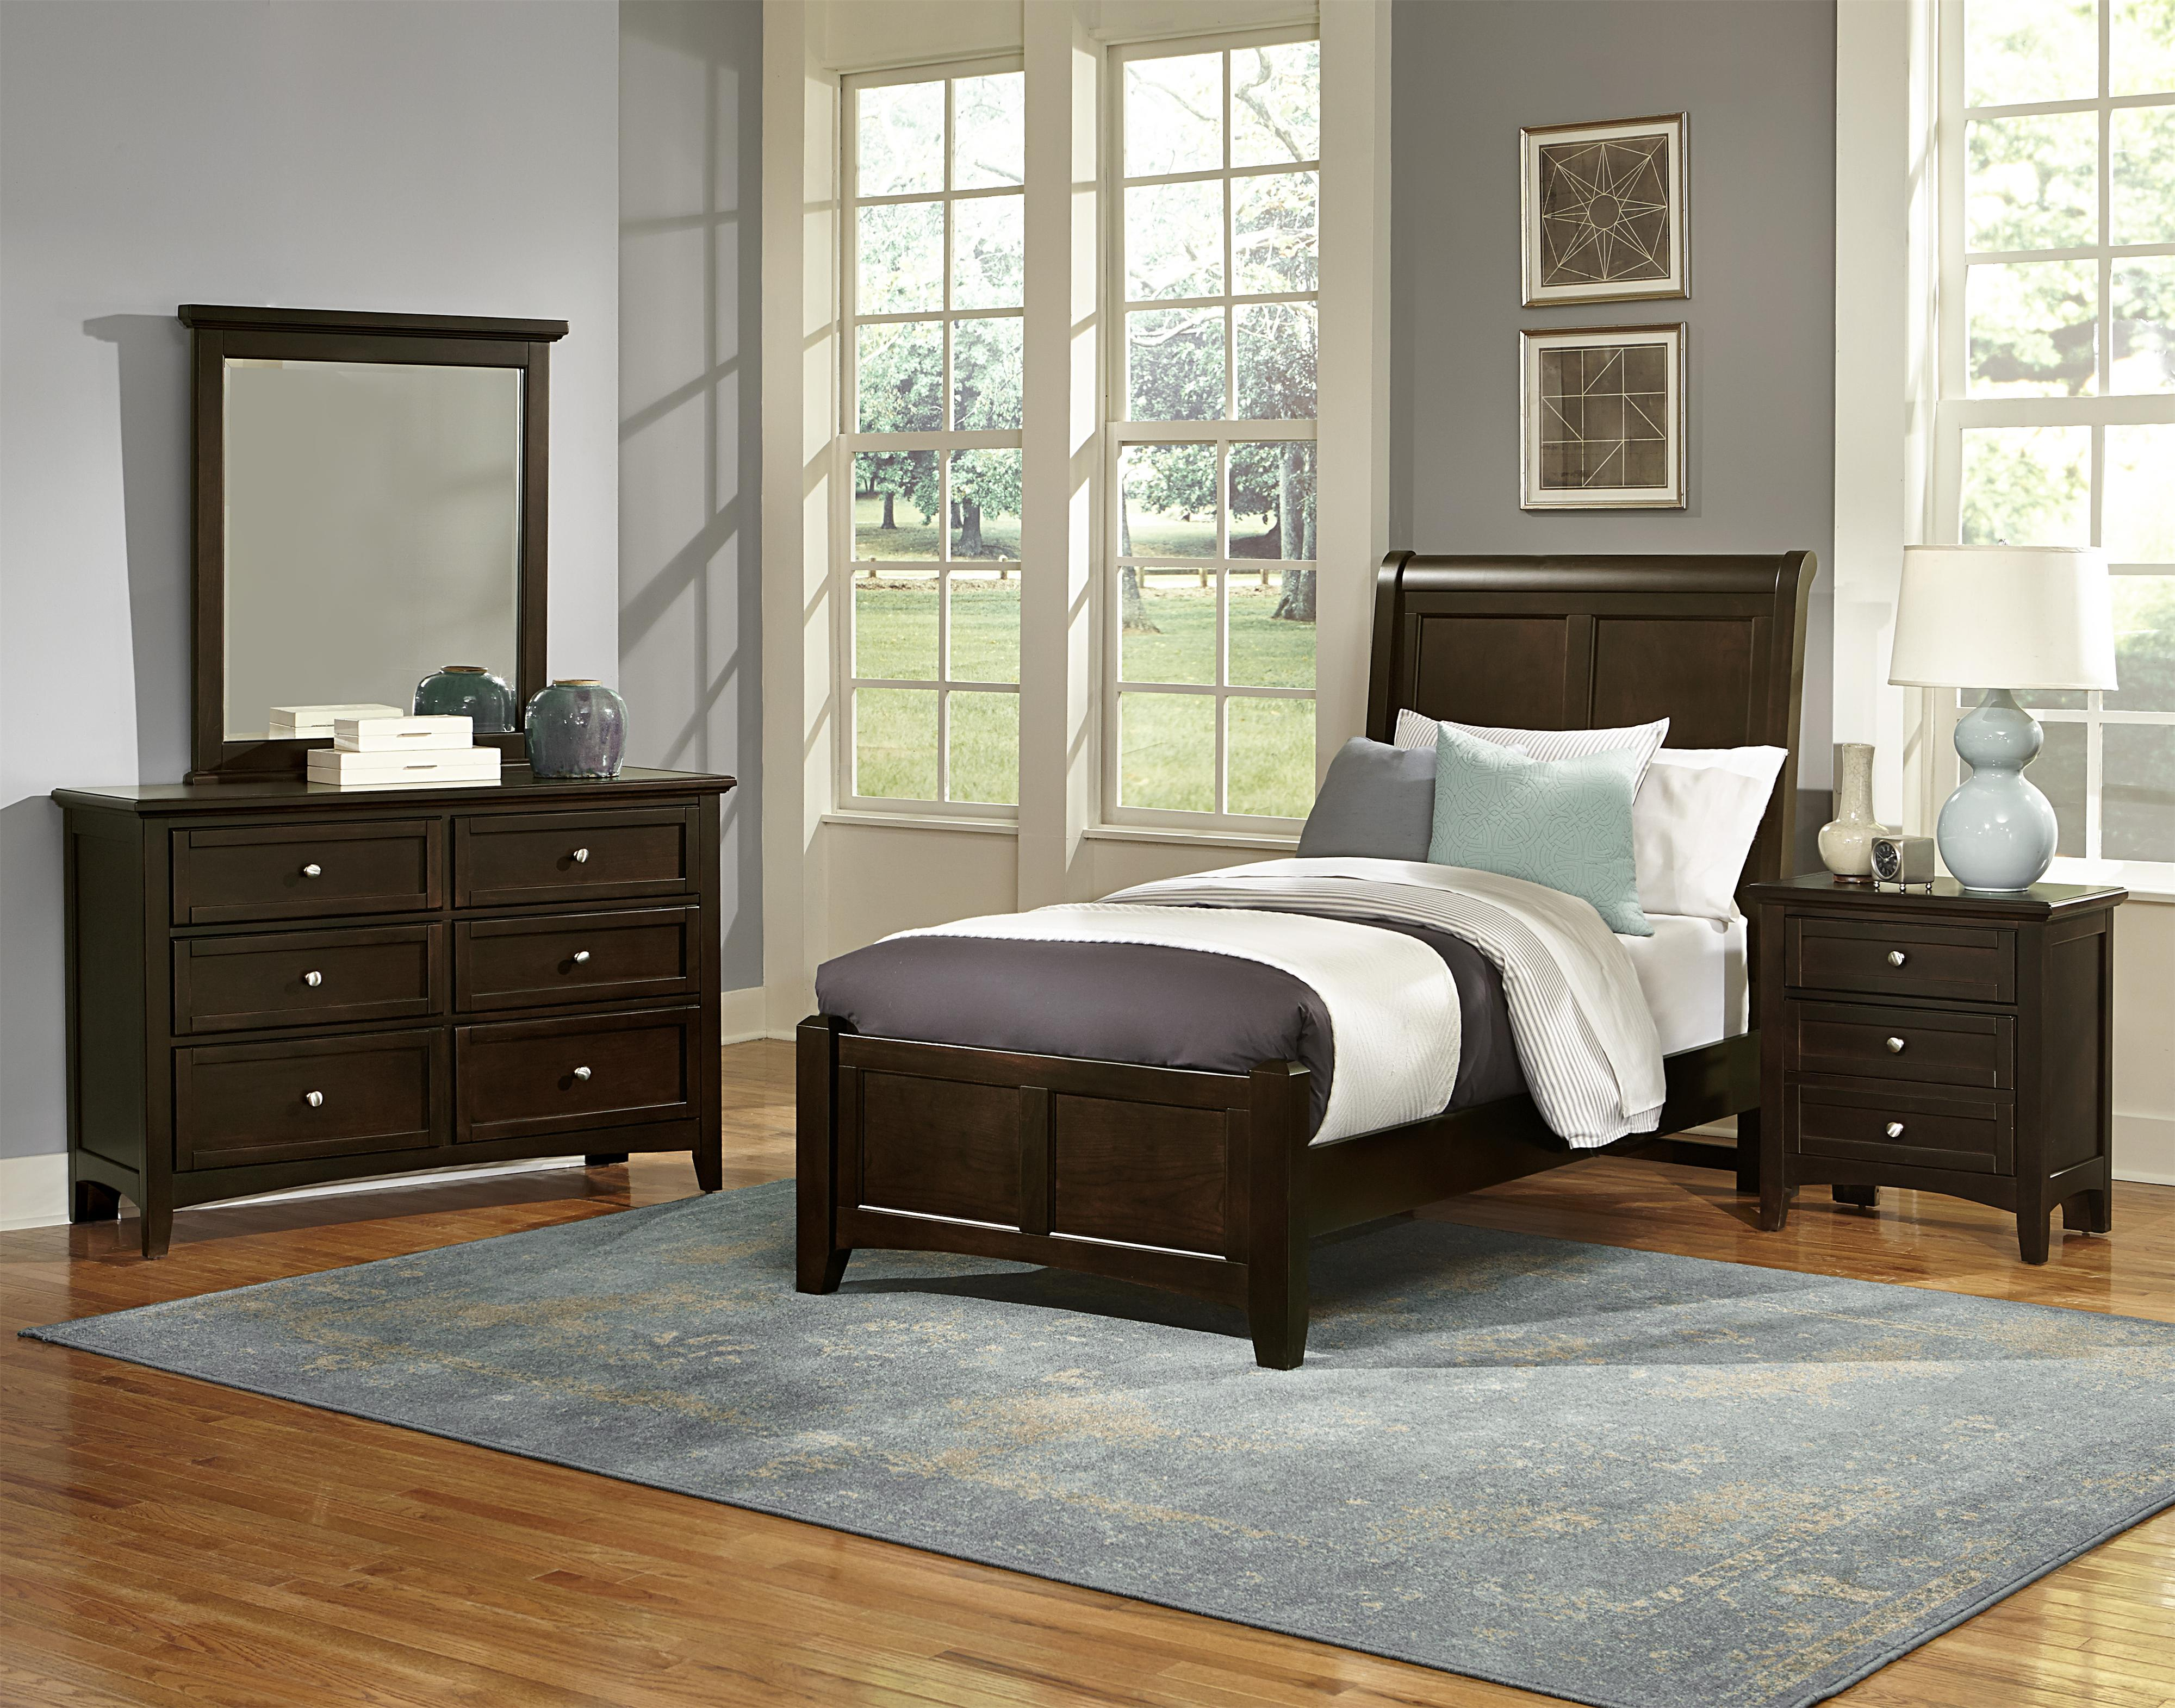 vaughan bassett bonanza twin bedroom group great american home store bedroom groups. Black Bedroom Furniture Sets. Home Design Ideas